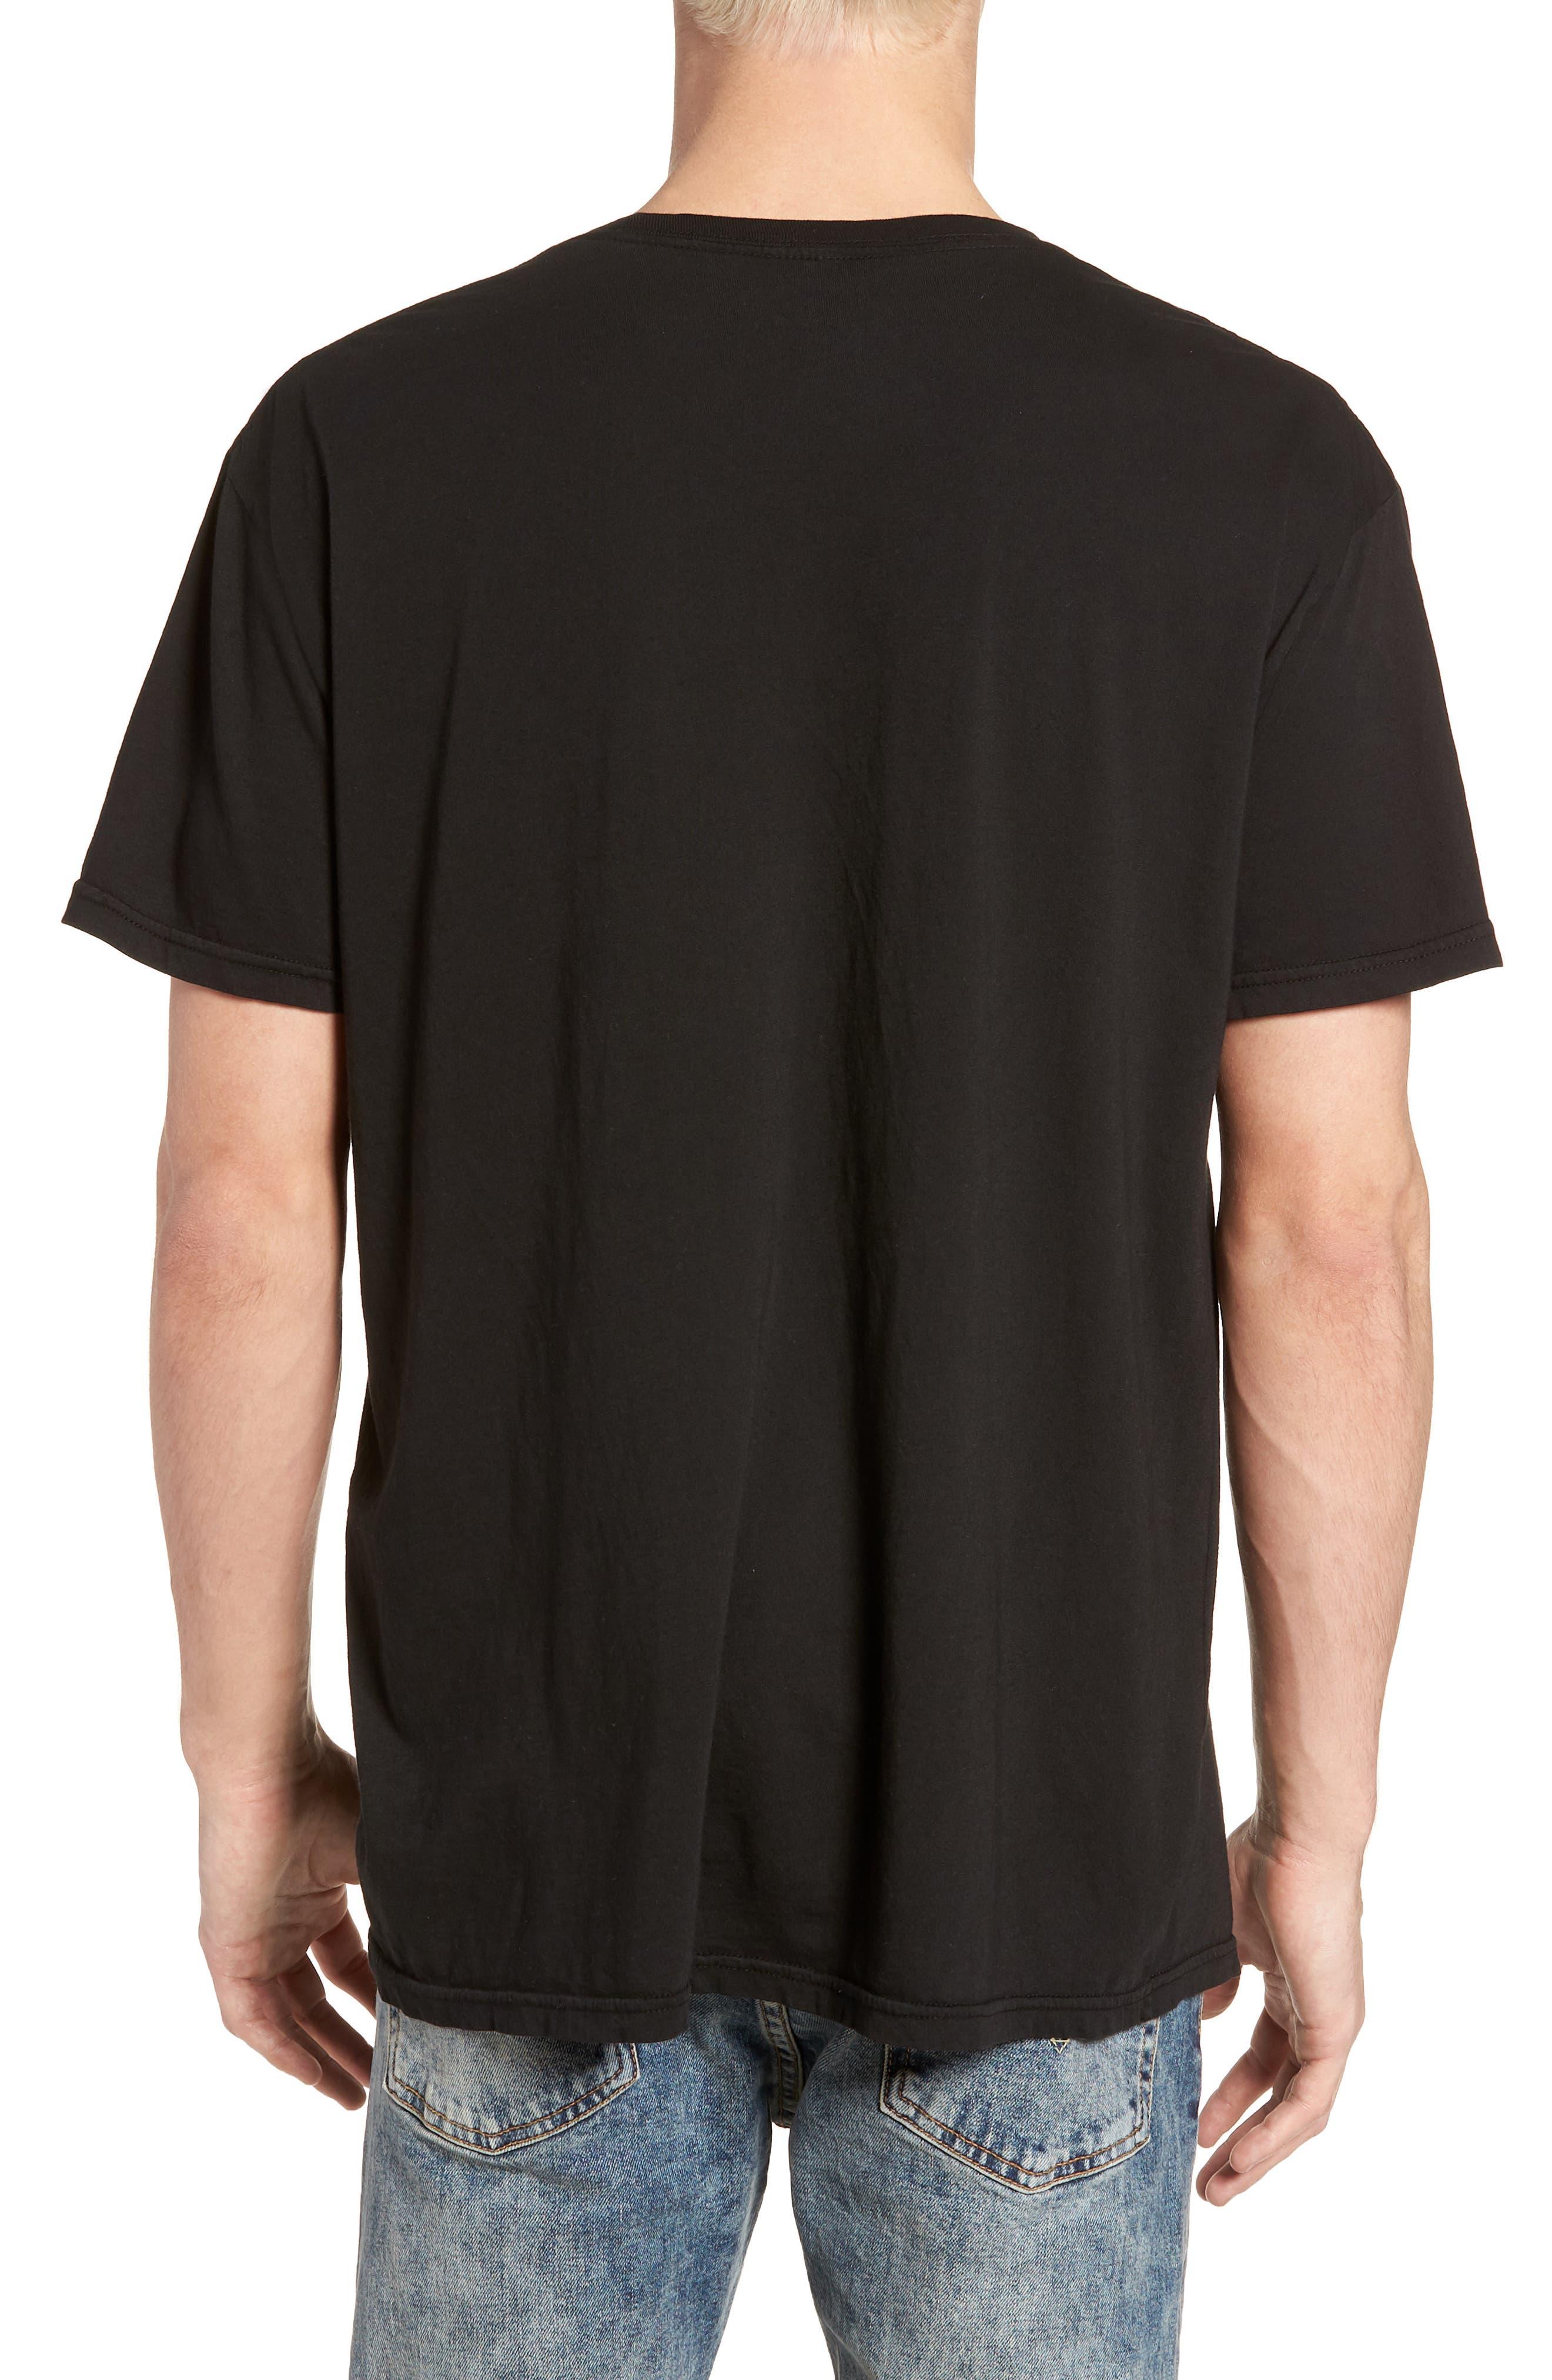 Misfits Graphic T-Shirt,                             Alternate thumbnail 2, color,                             Black